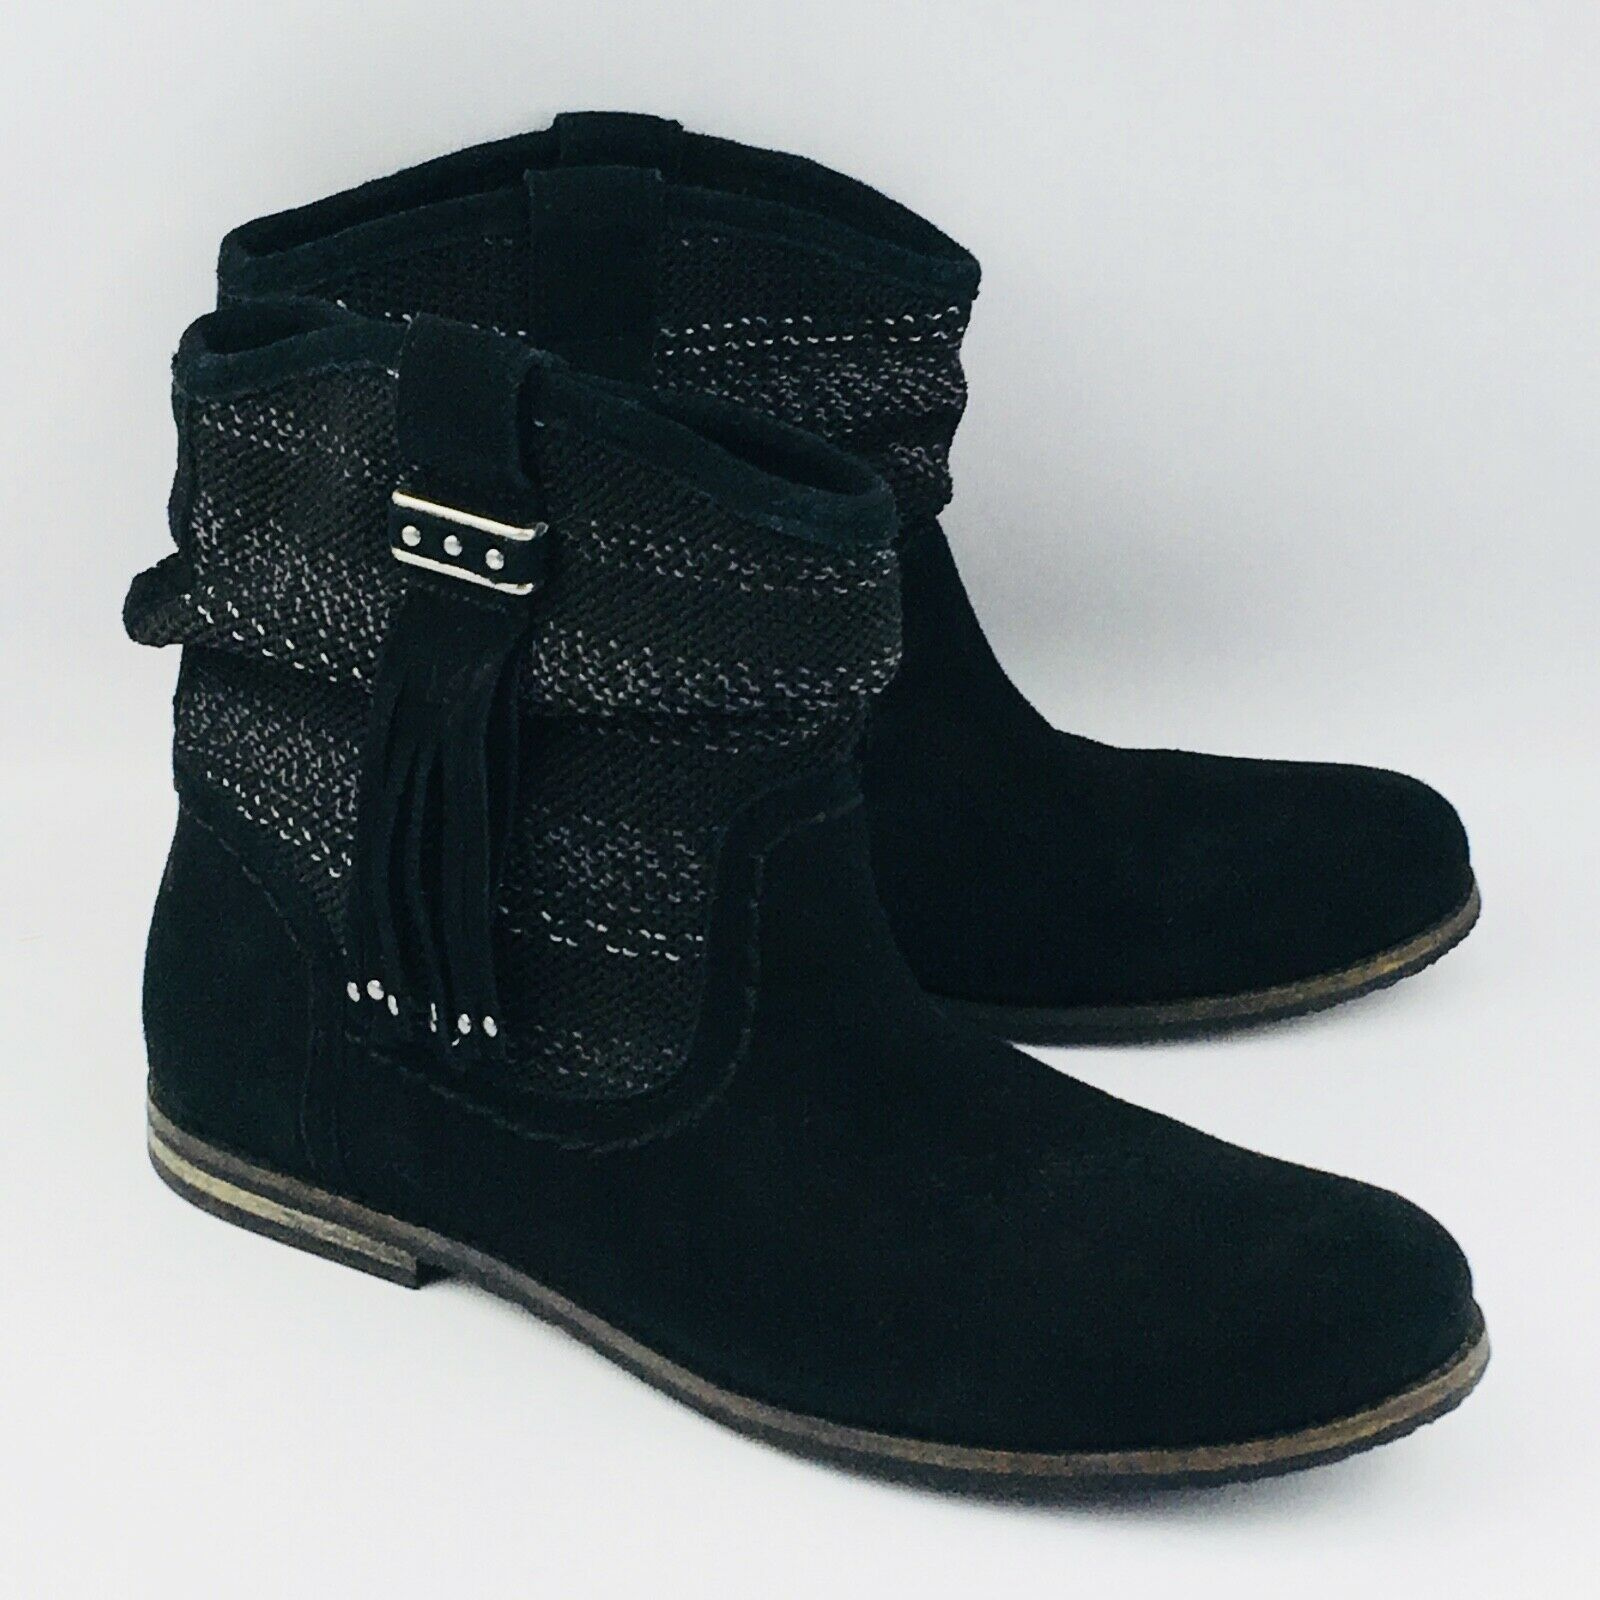 Womens 10 The Sak Jezebel Boots Black Leather Ankle Slouch Tassel 7